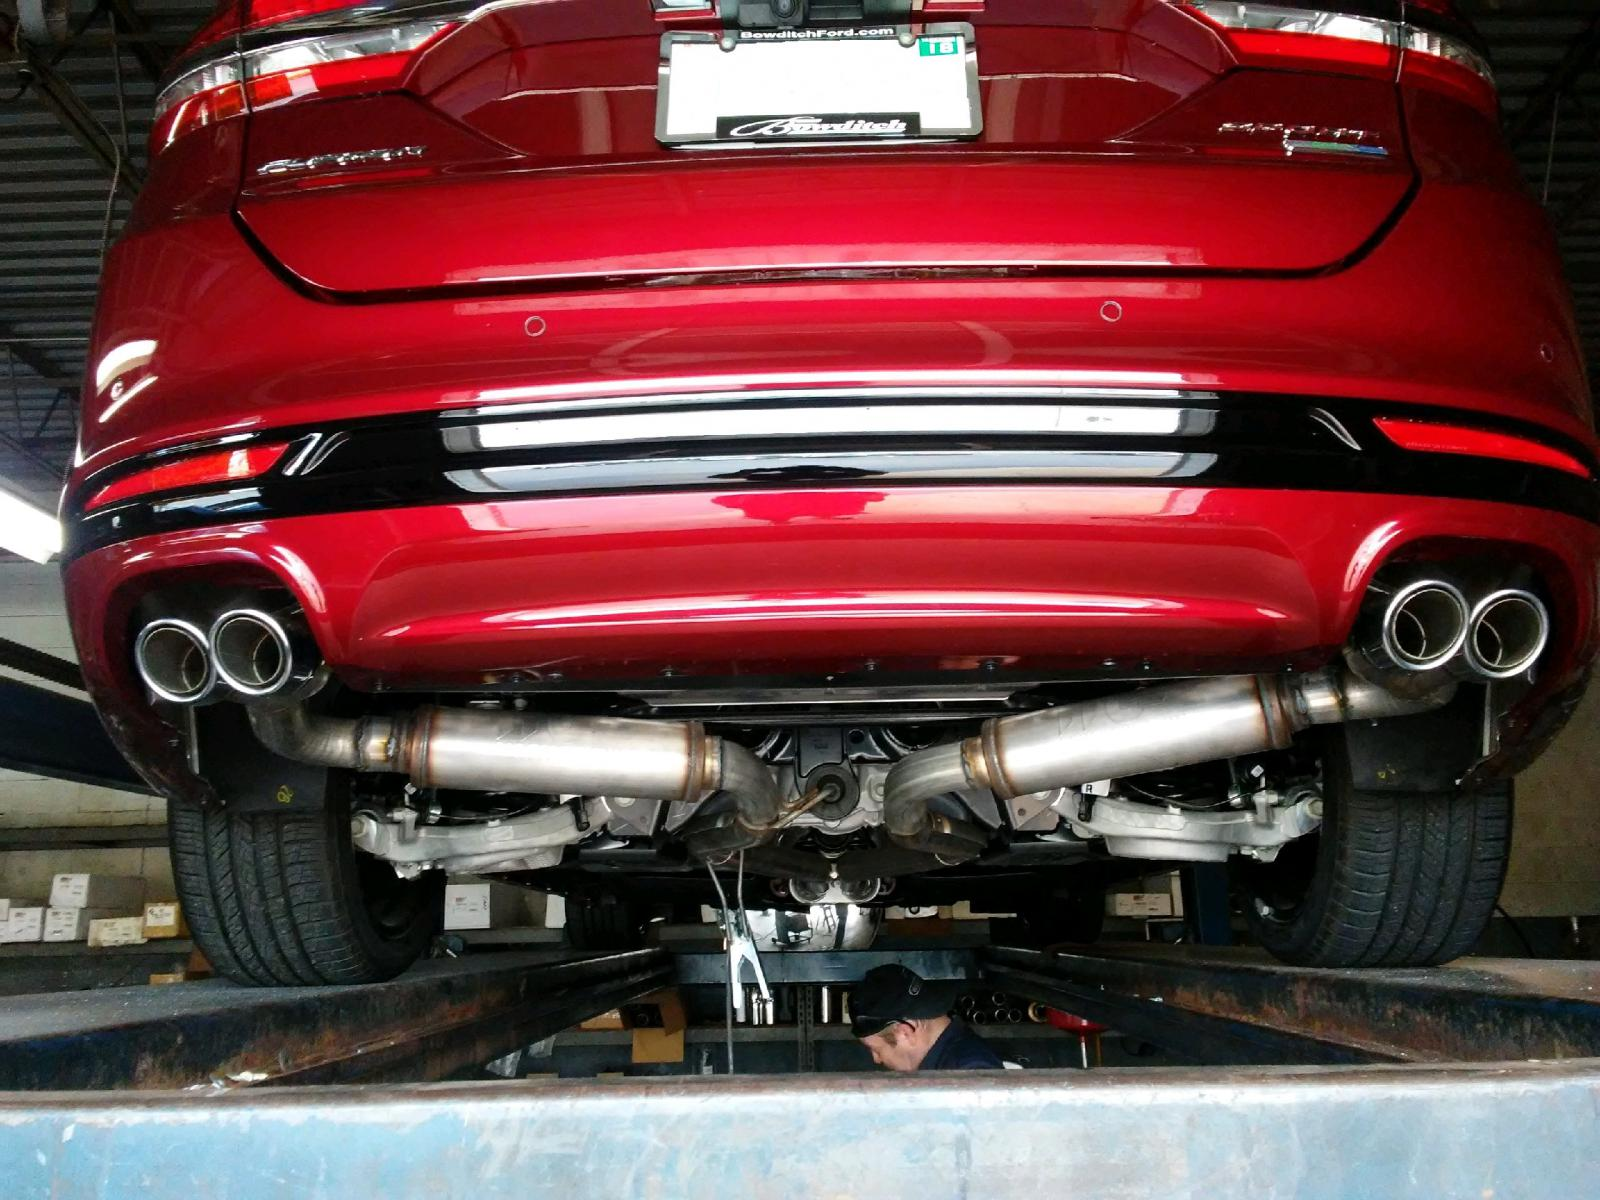 stock muffler removal ford fusion v6